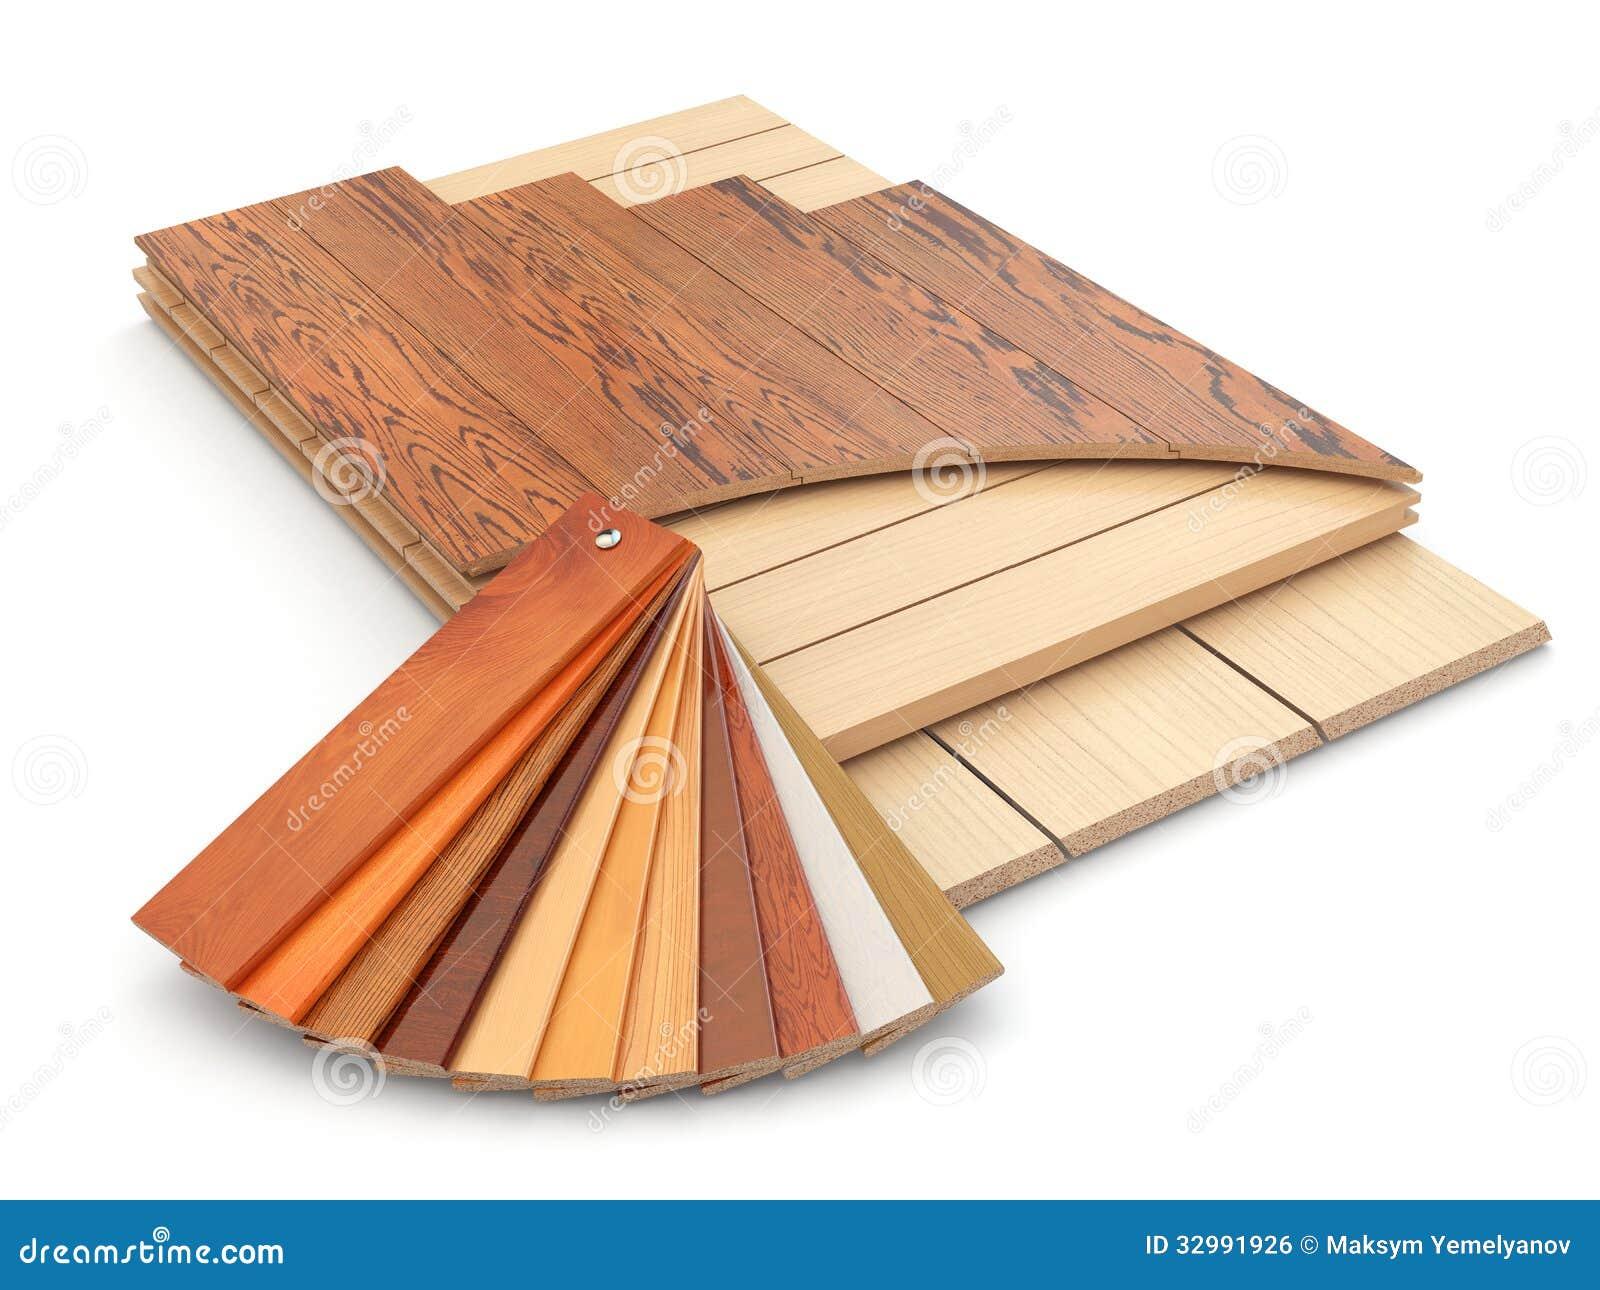 Installing Laminate Floor And Wood Samples Stock